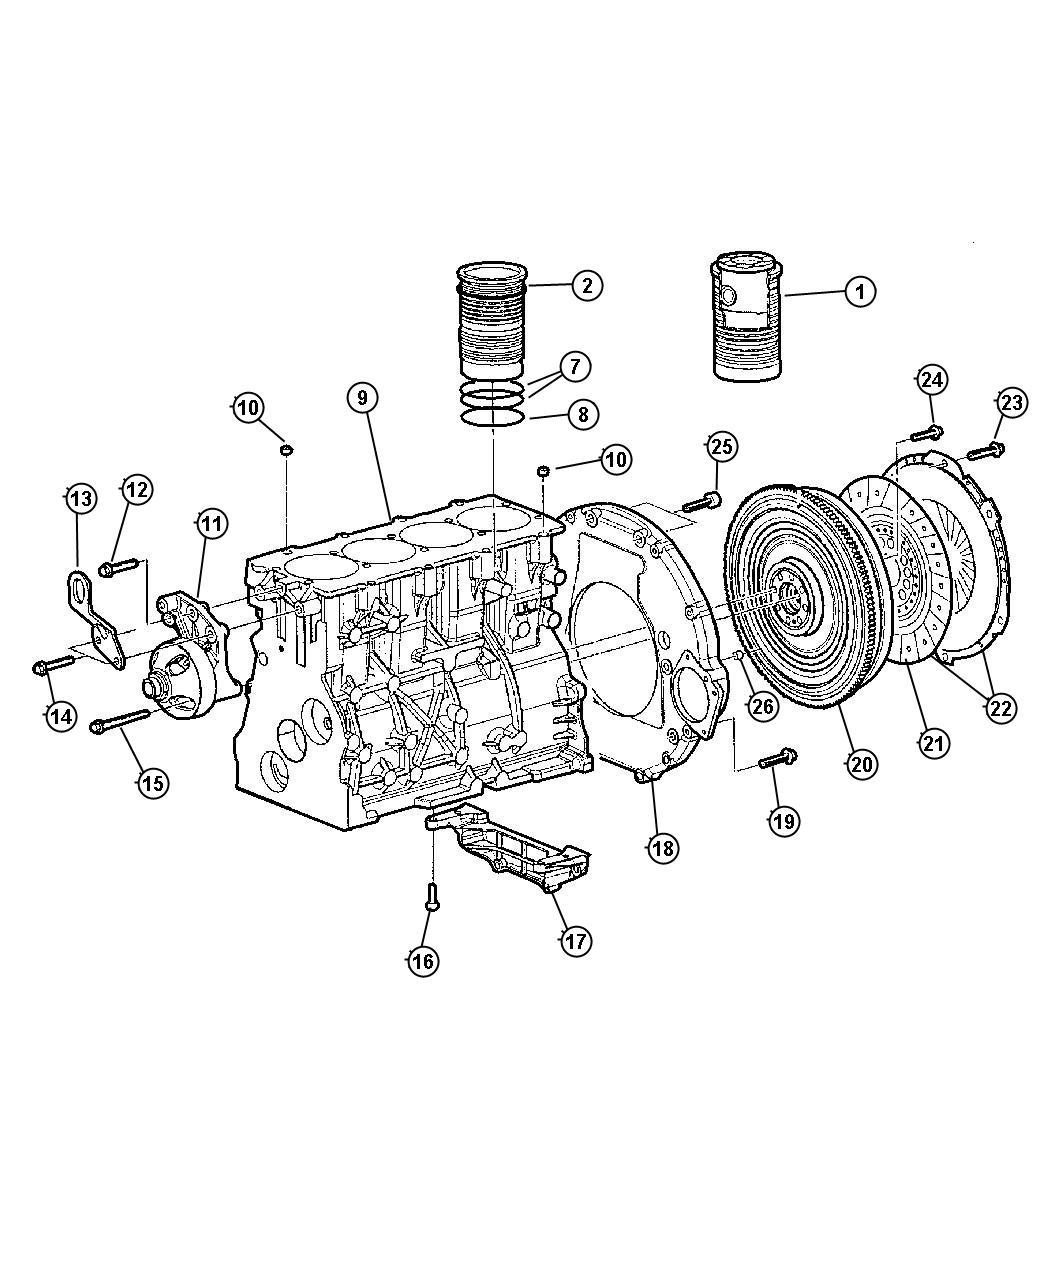 Jeep Wrangler Flywheel